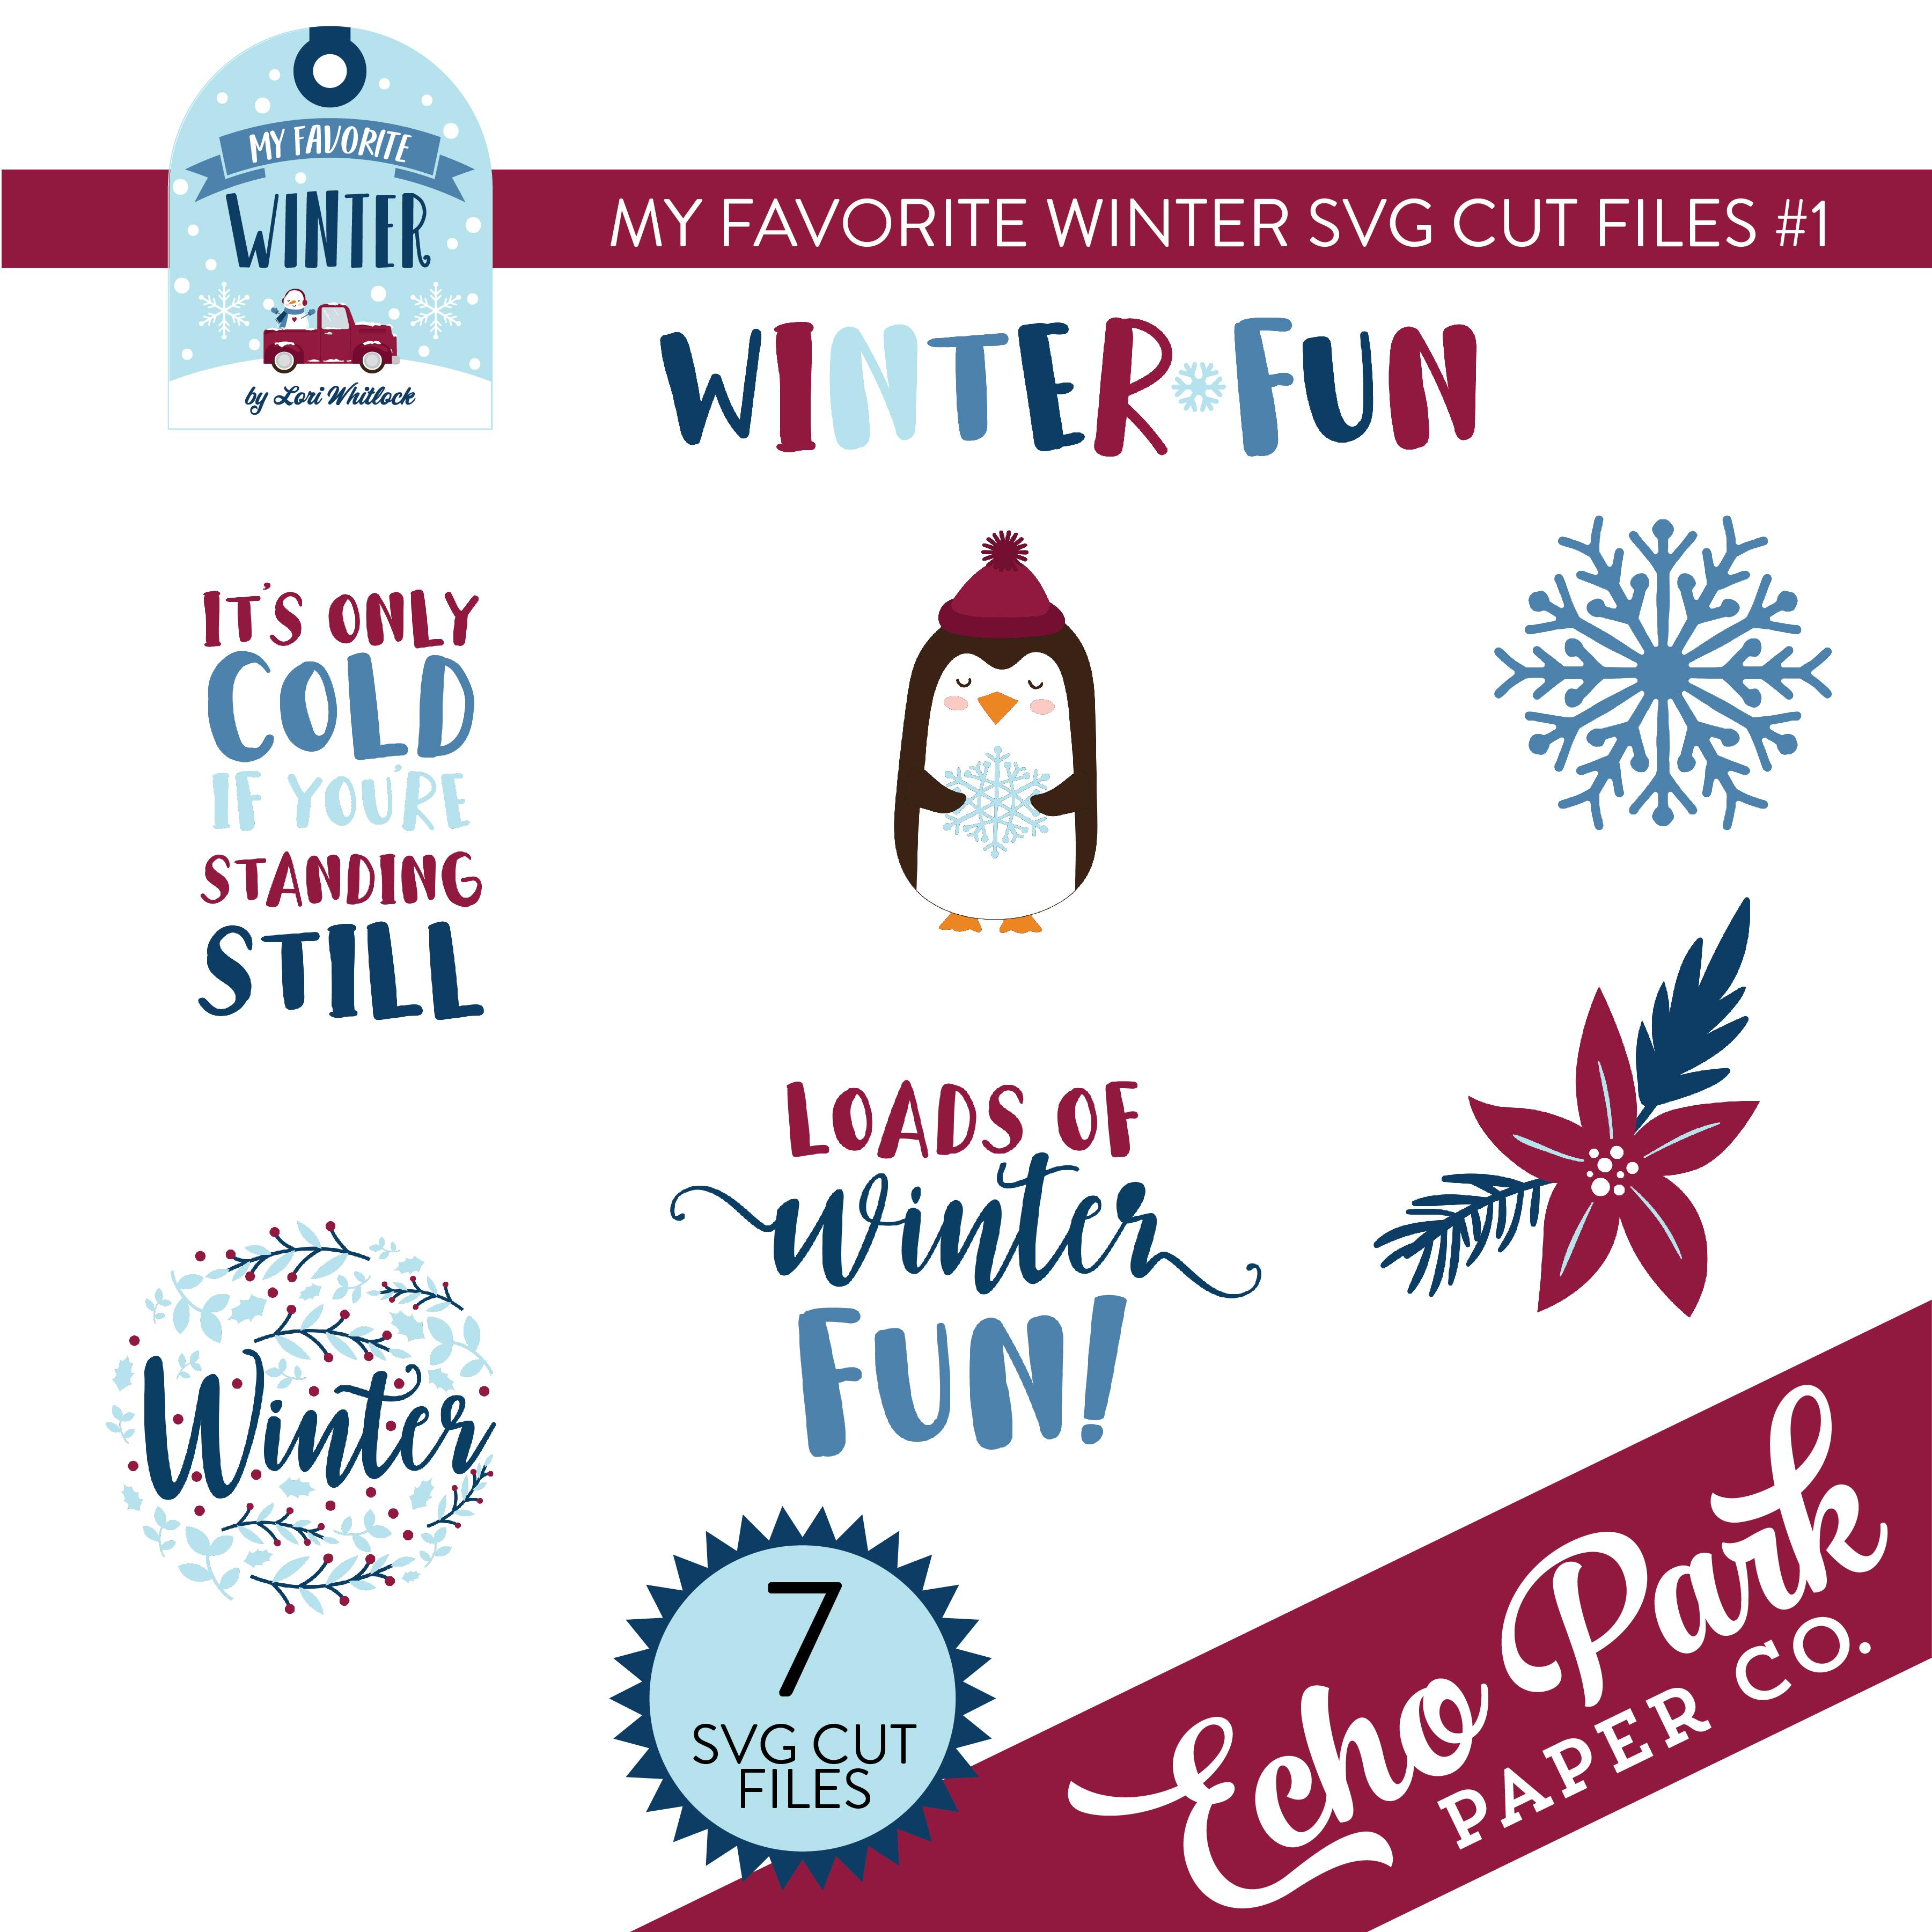 My Favorite Winter SVG Cut Files #1